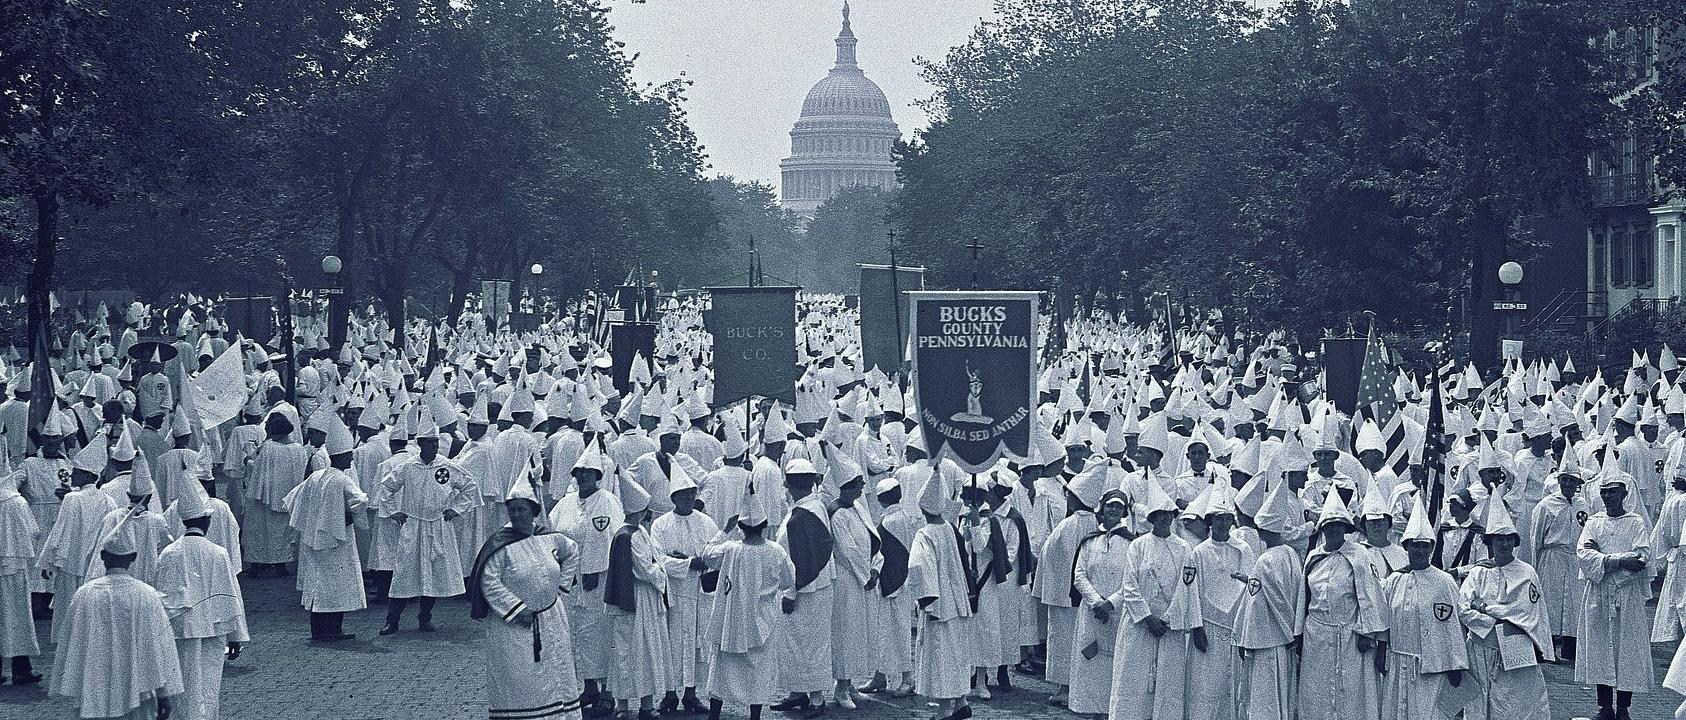 KKK March 8 1925